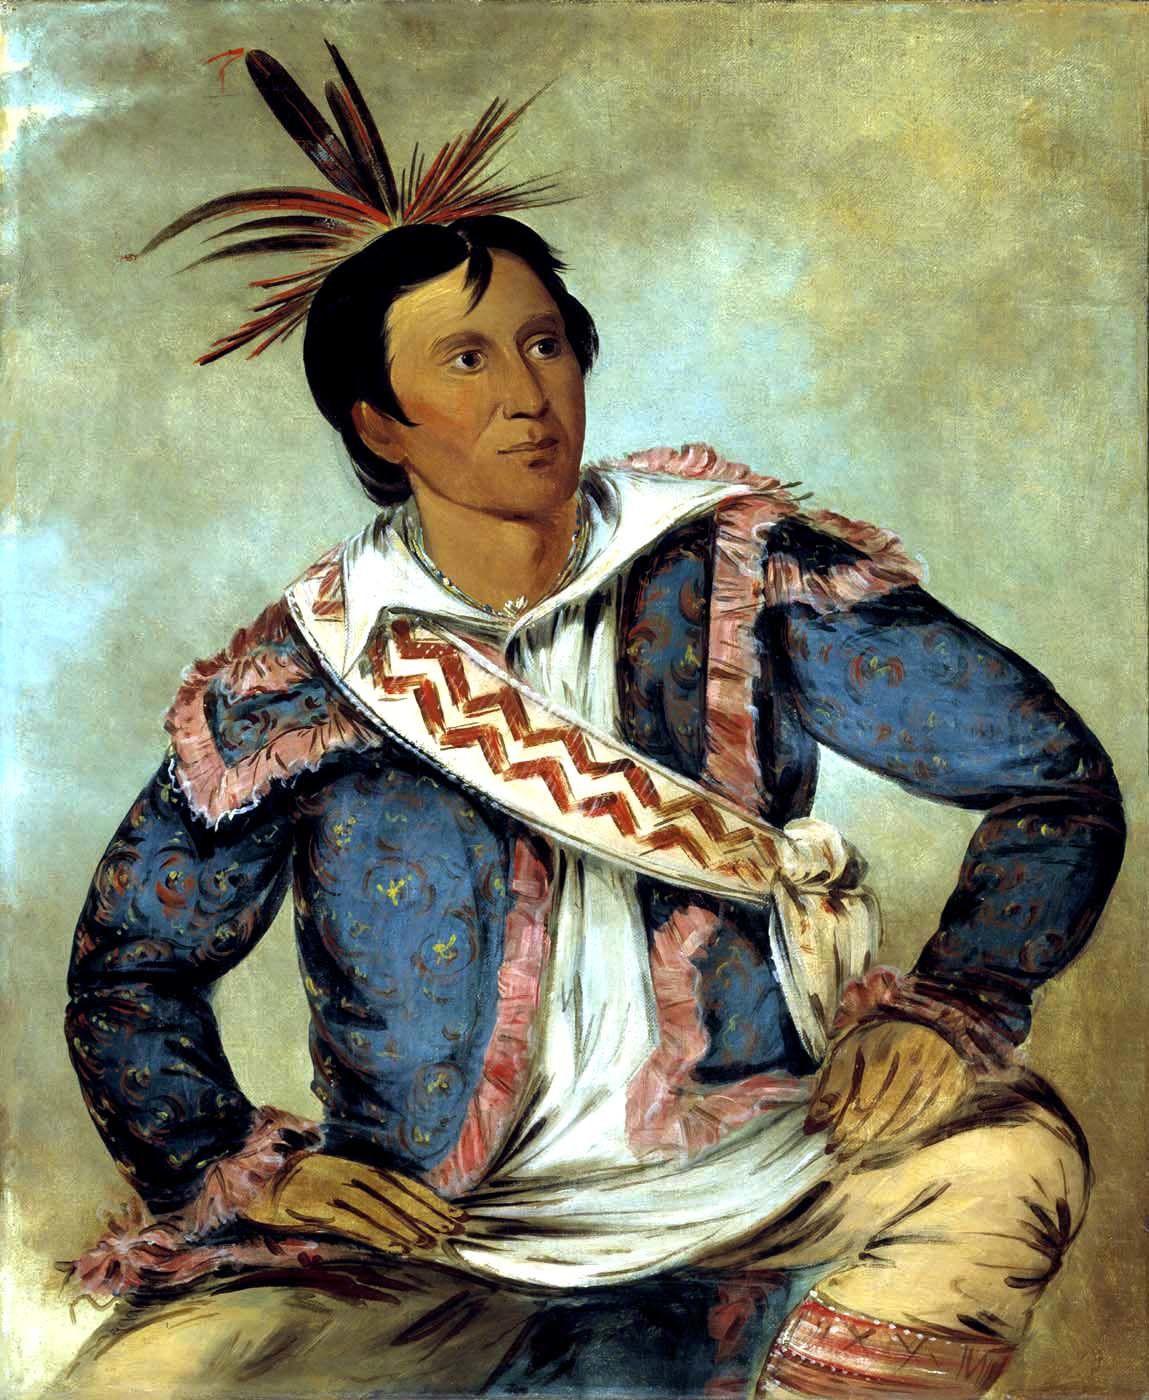 Le chef Chacta Peter Pitchlynn (Há-tchoo-túc-knee, Snapping Turtle), peint en 1834, par George Catlin.